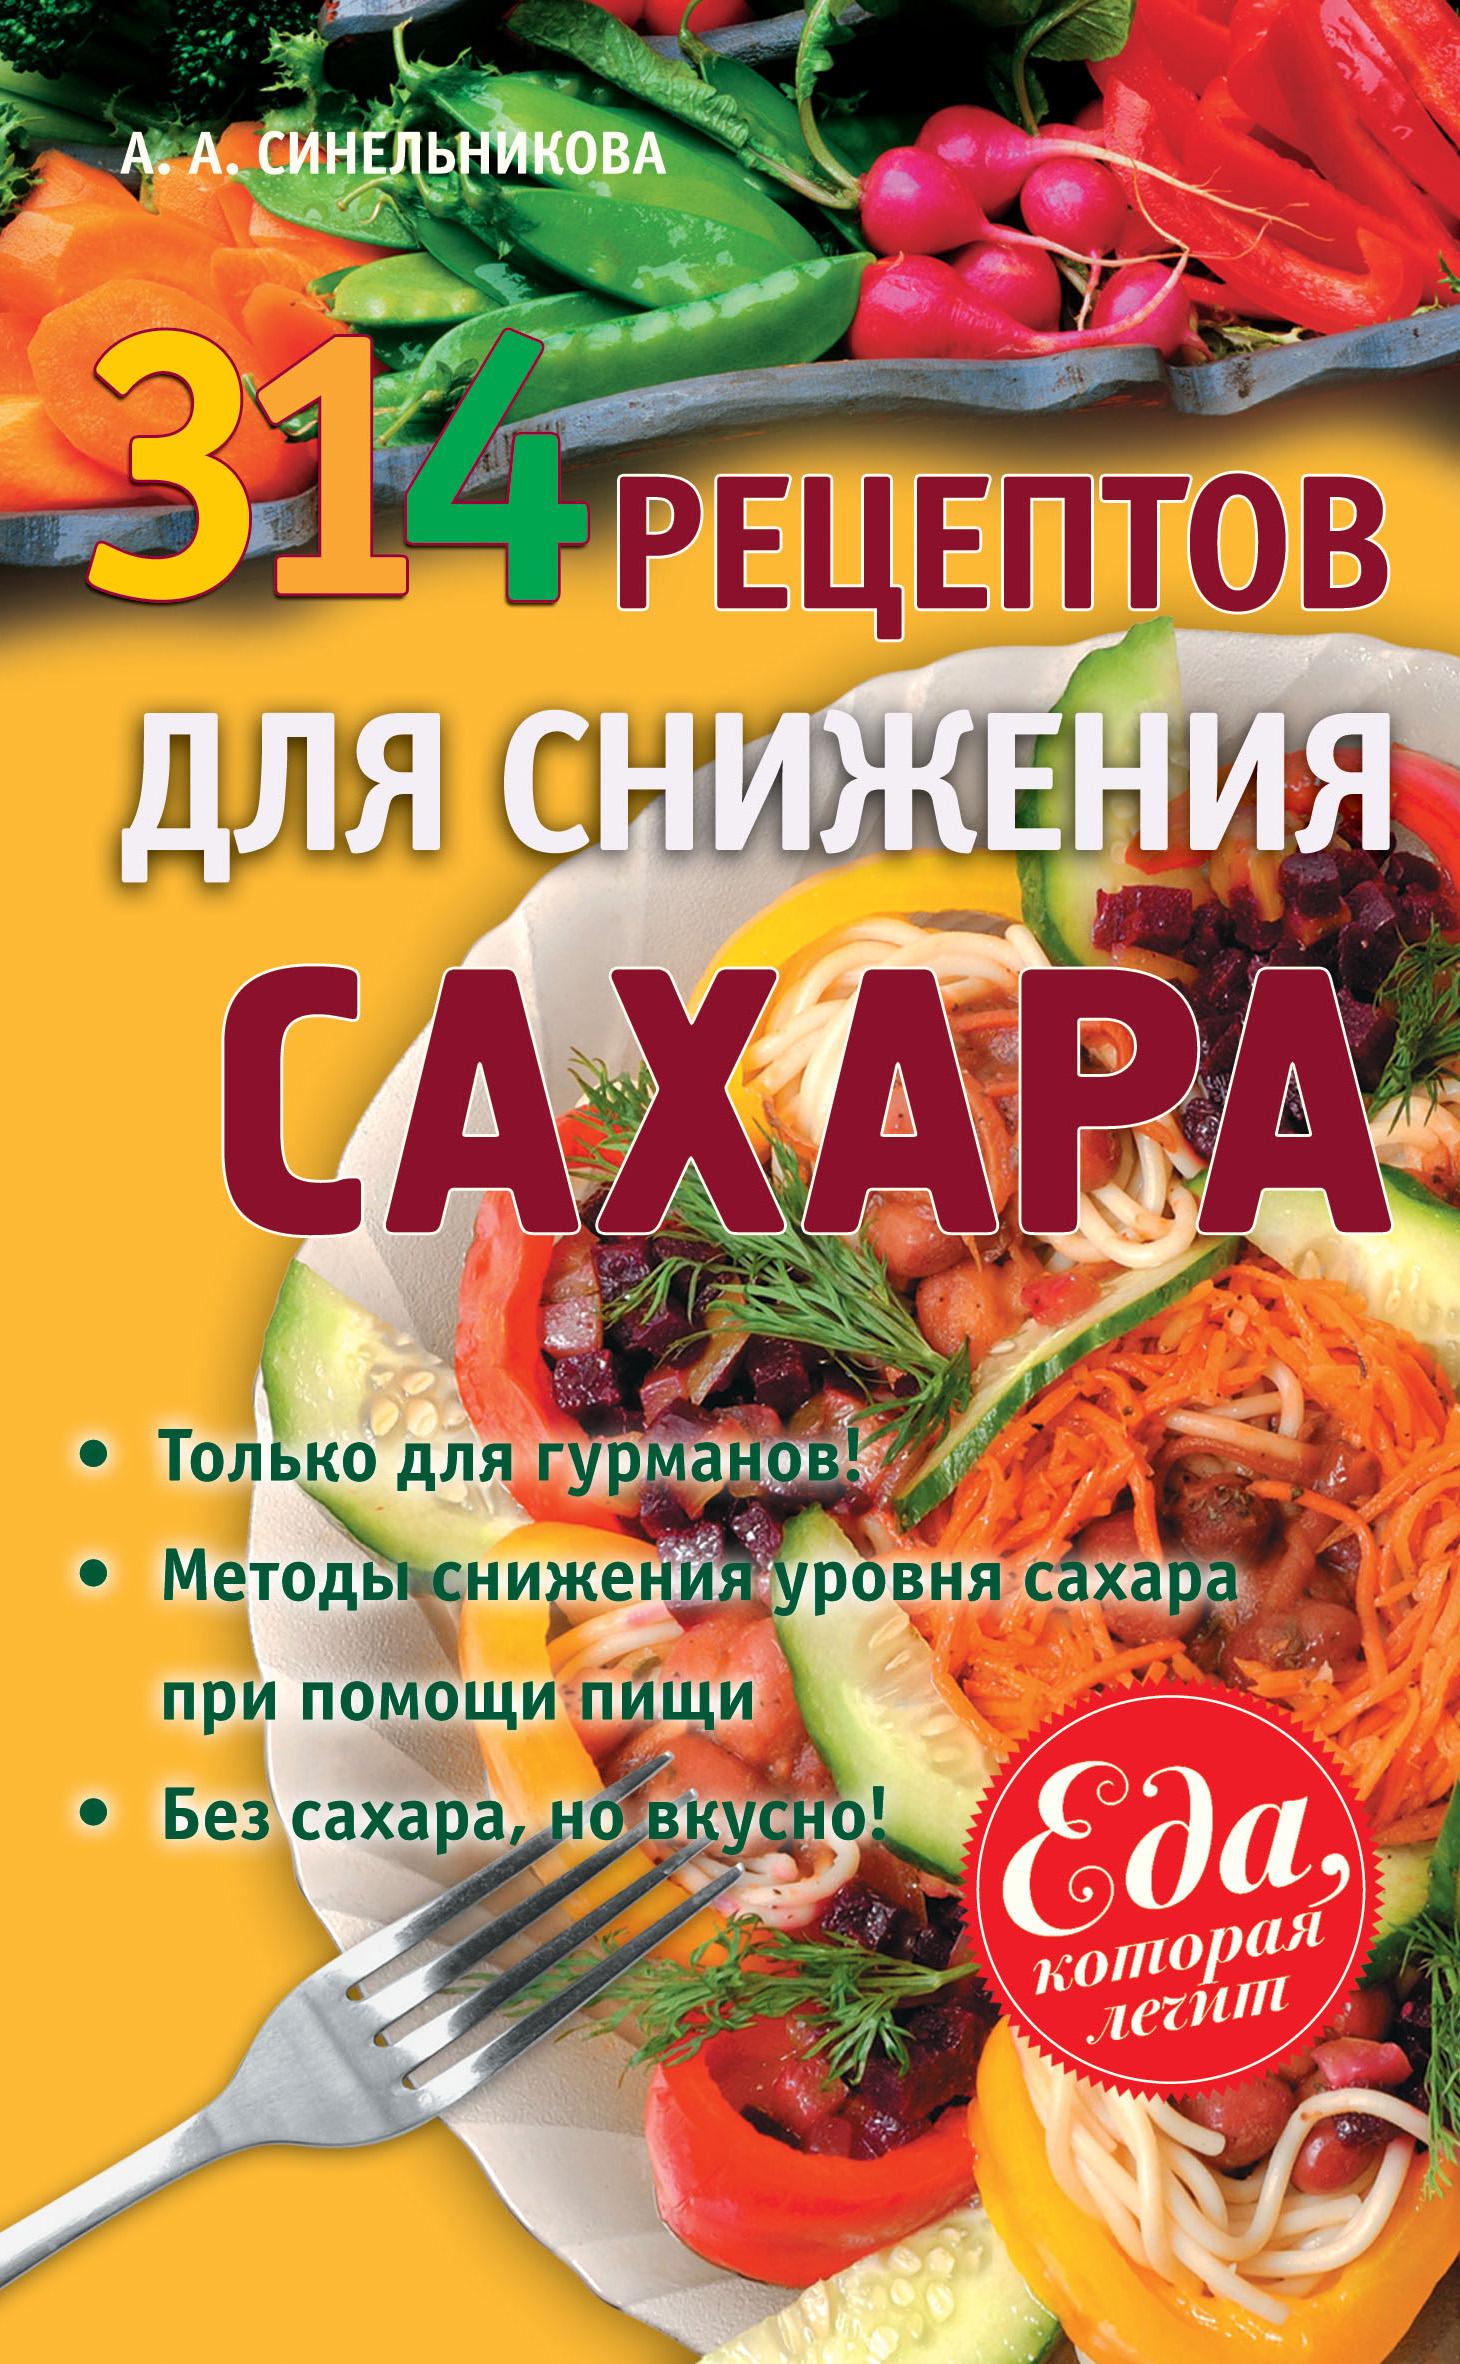 А. А. 314 рецептов для снижения сахара